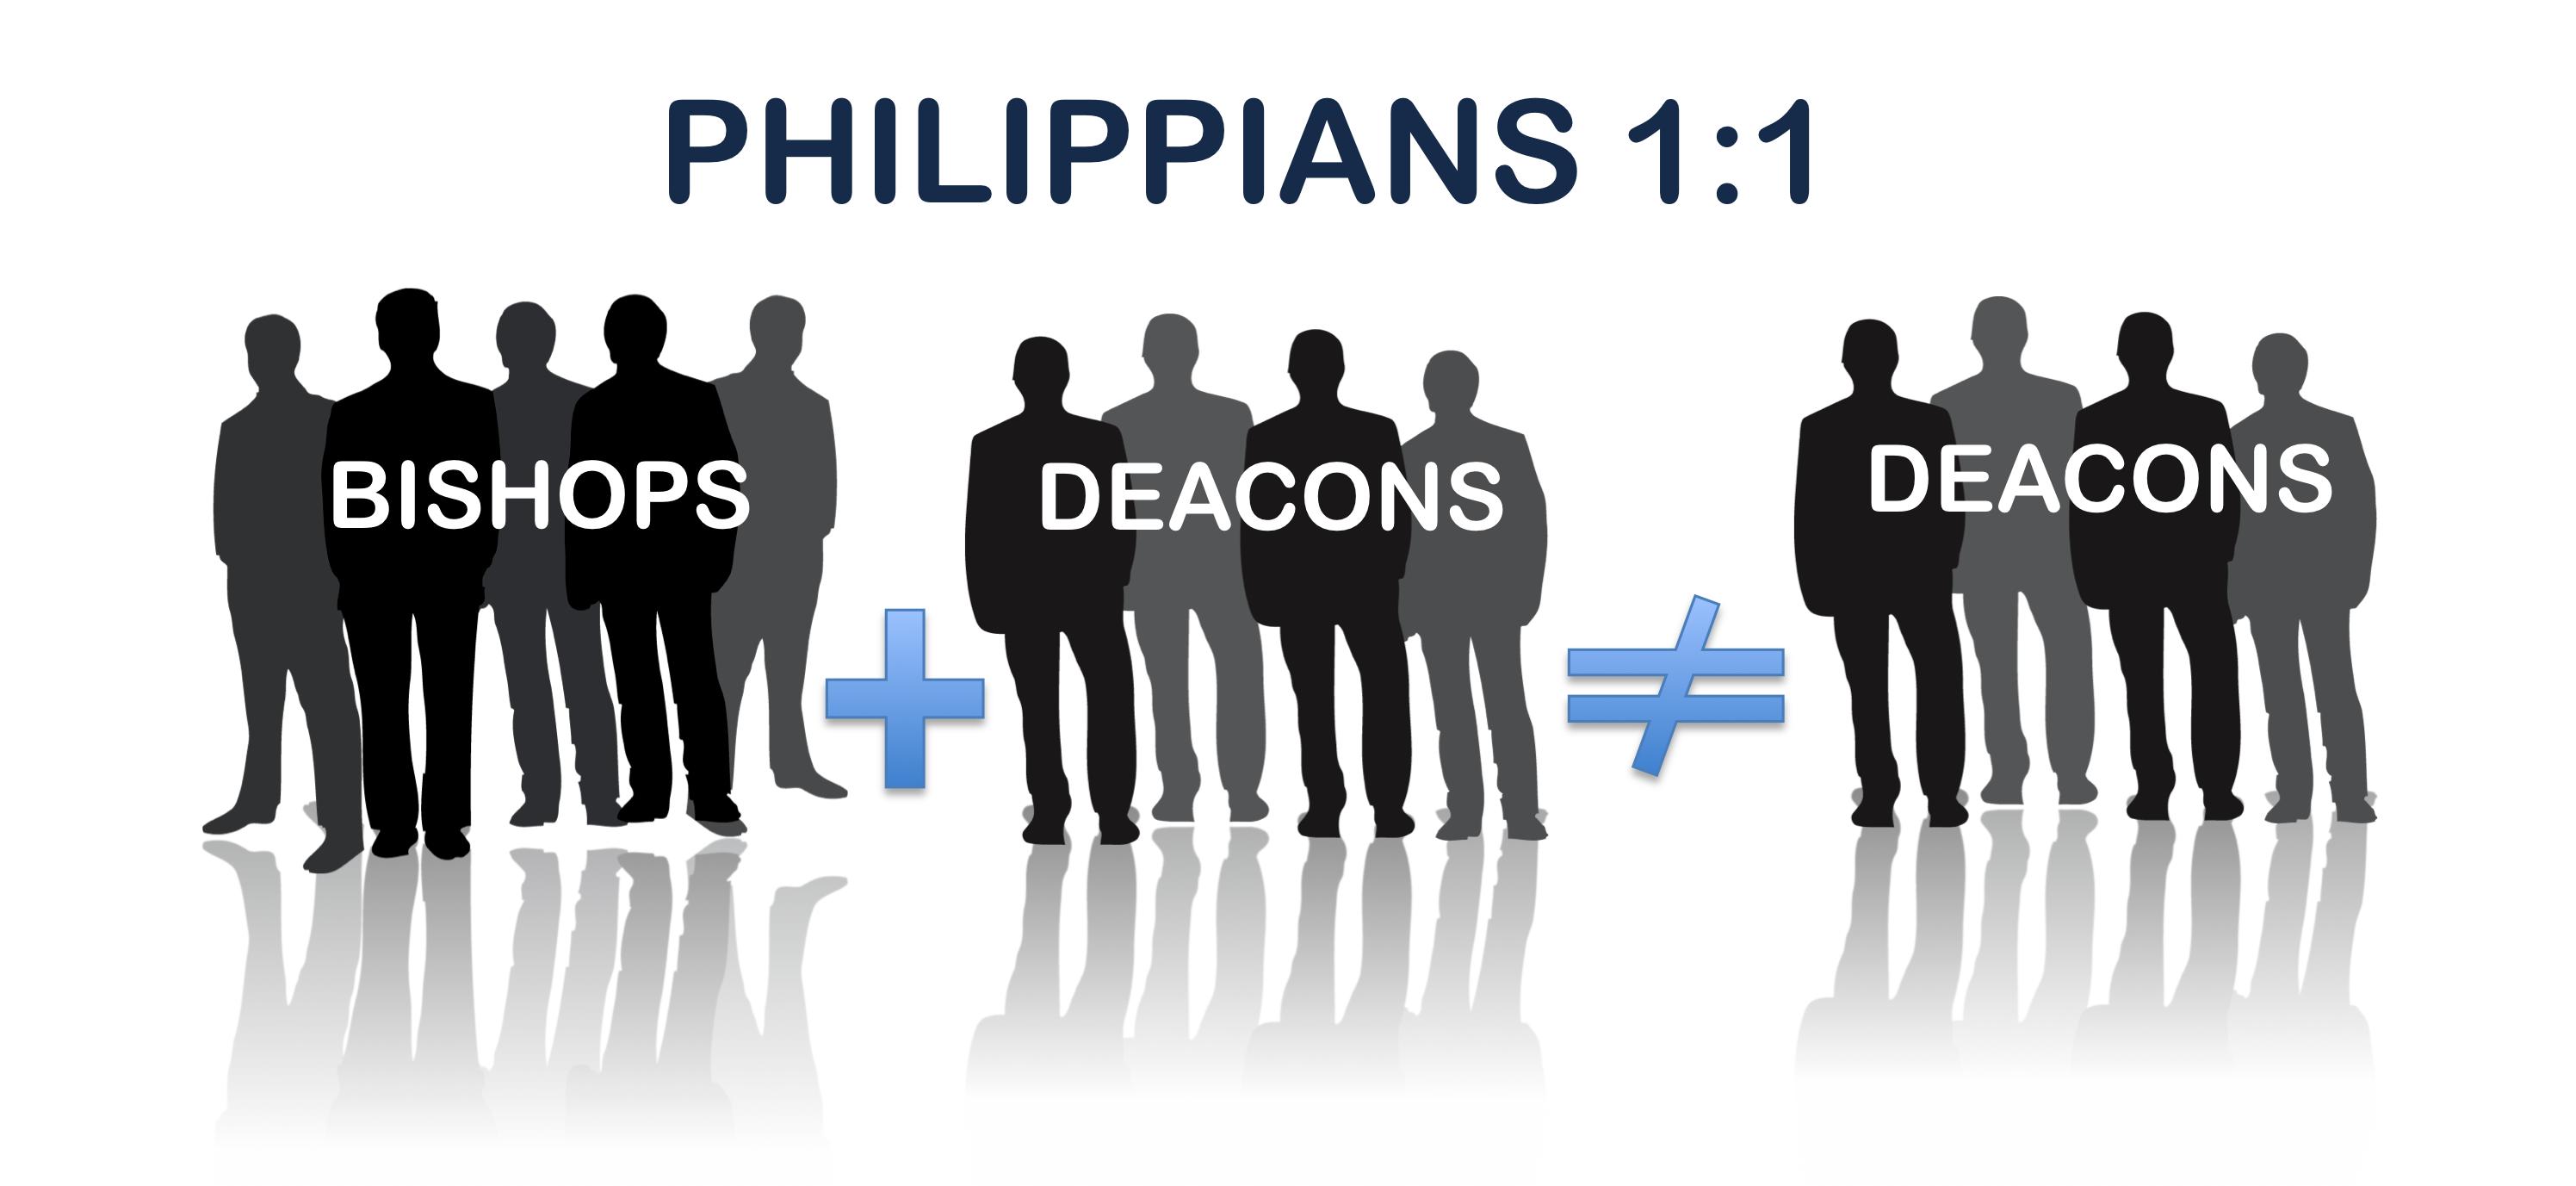 deacons3